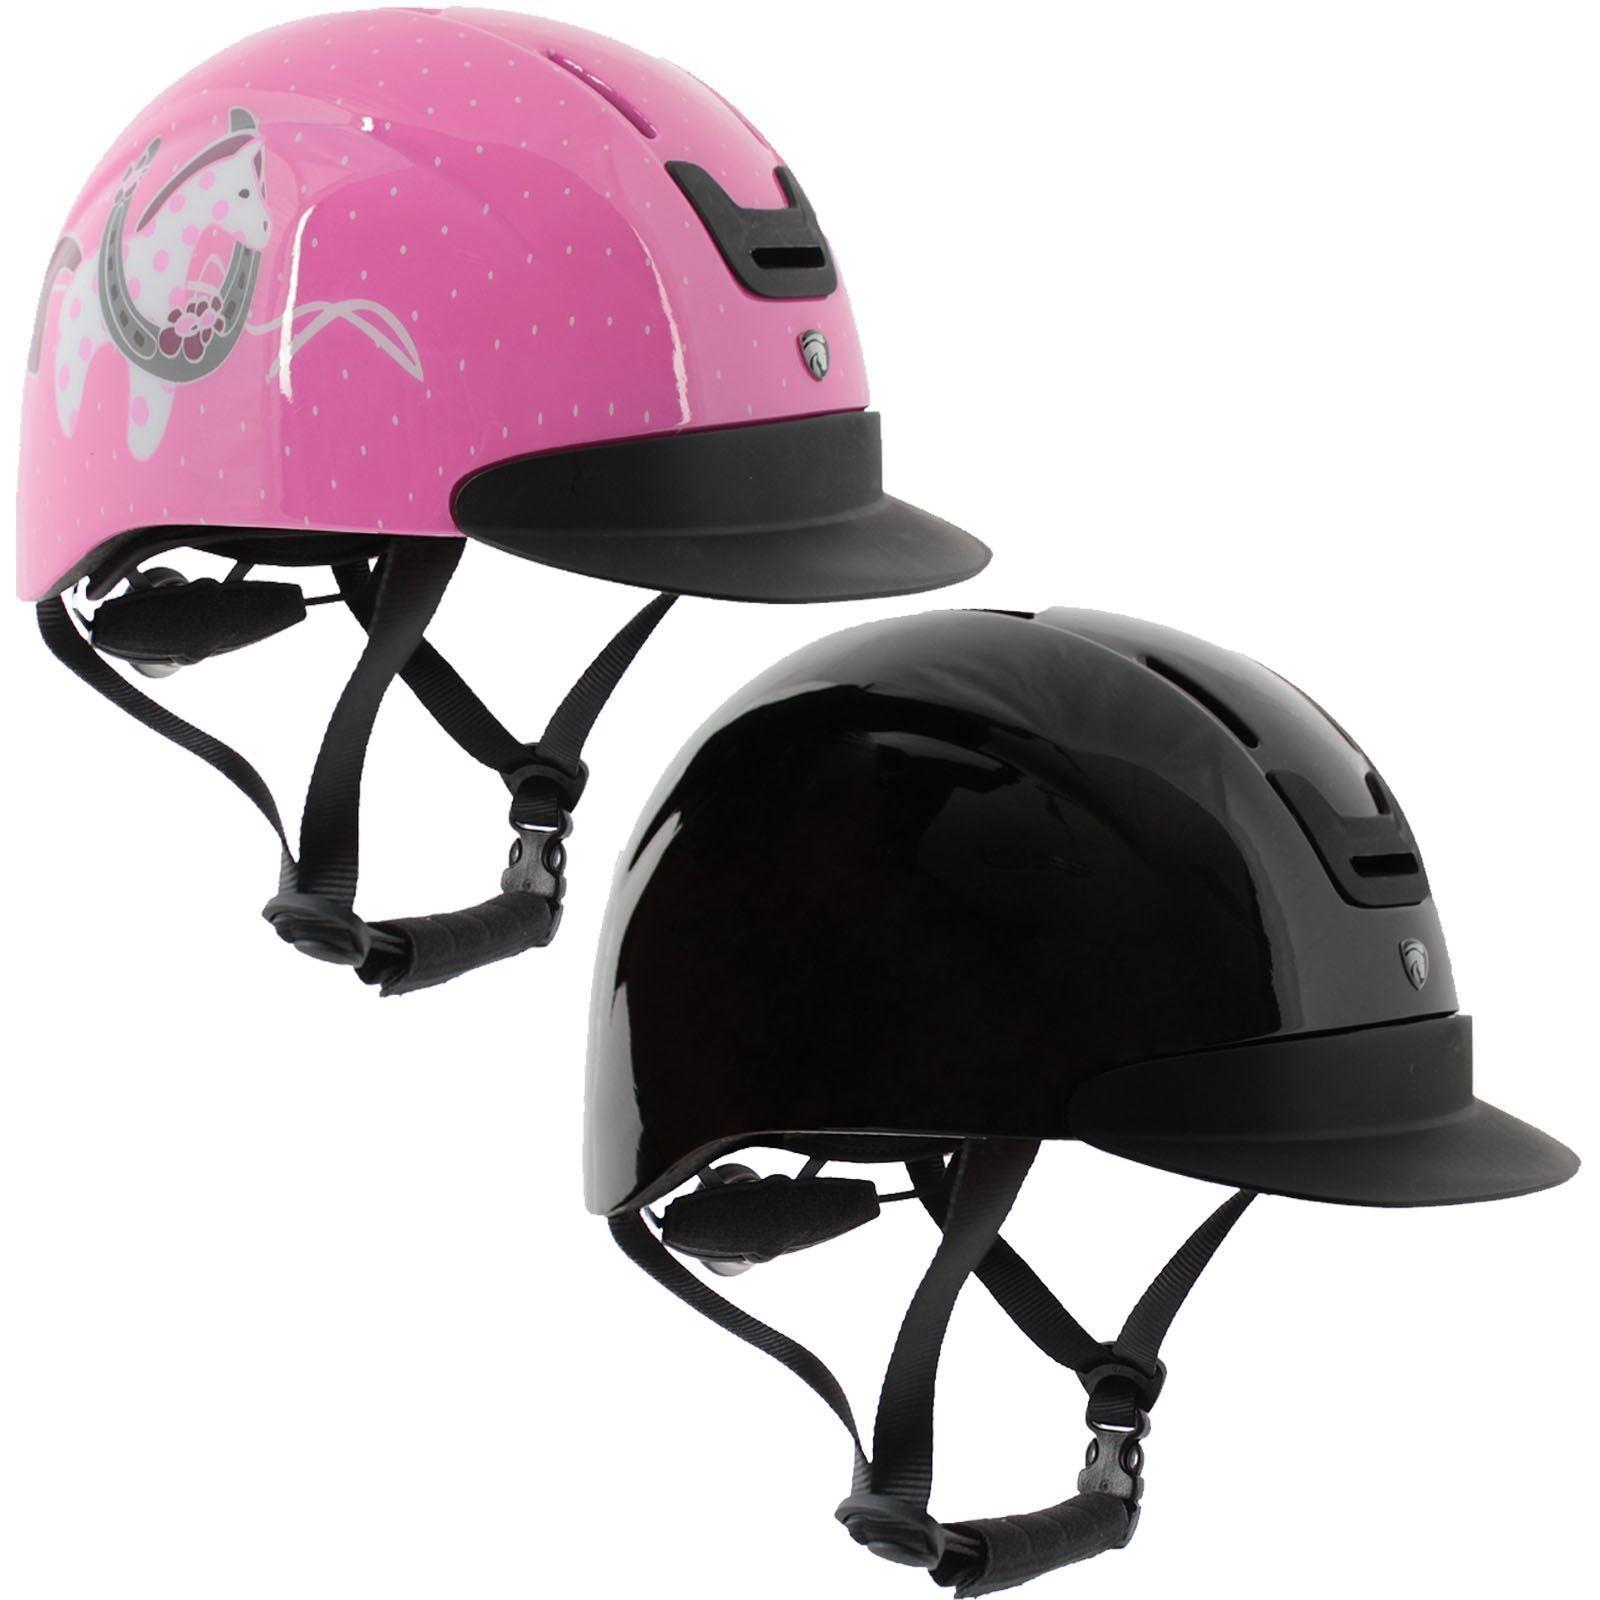 Horka Equestrian Kids Junior Horsy Durable Comfort Fit Horseprint Safety Helmet